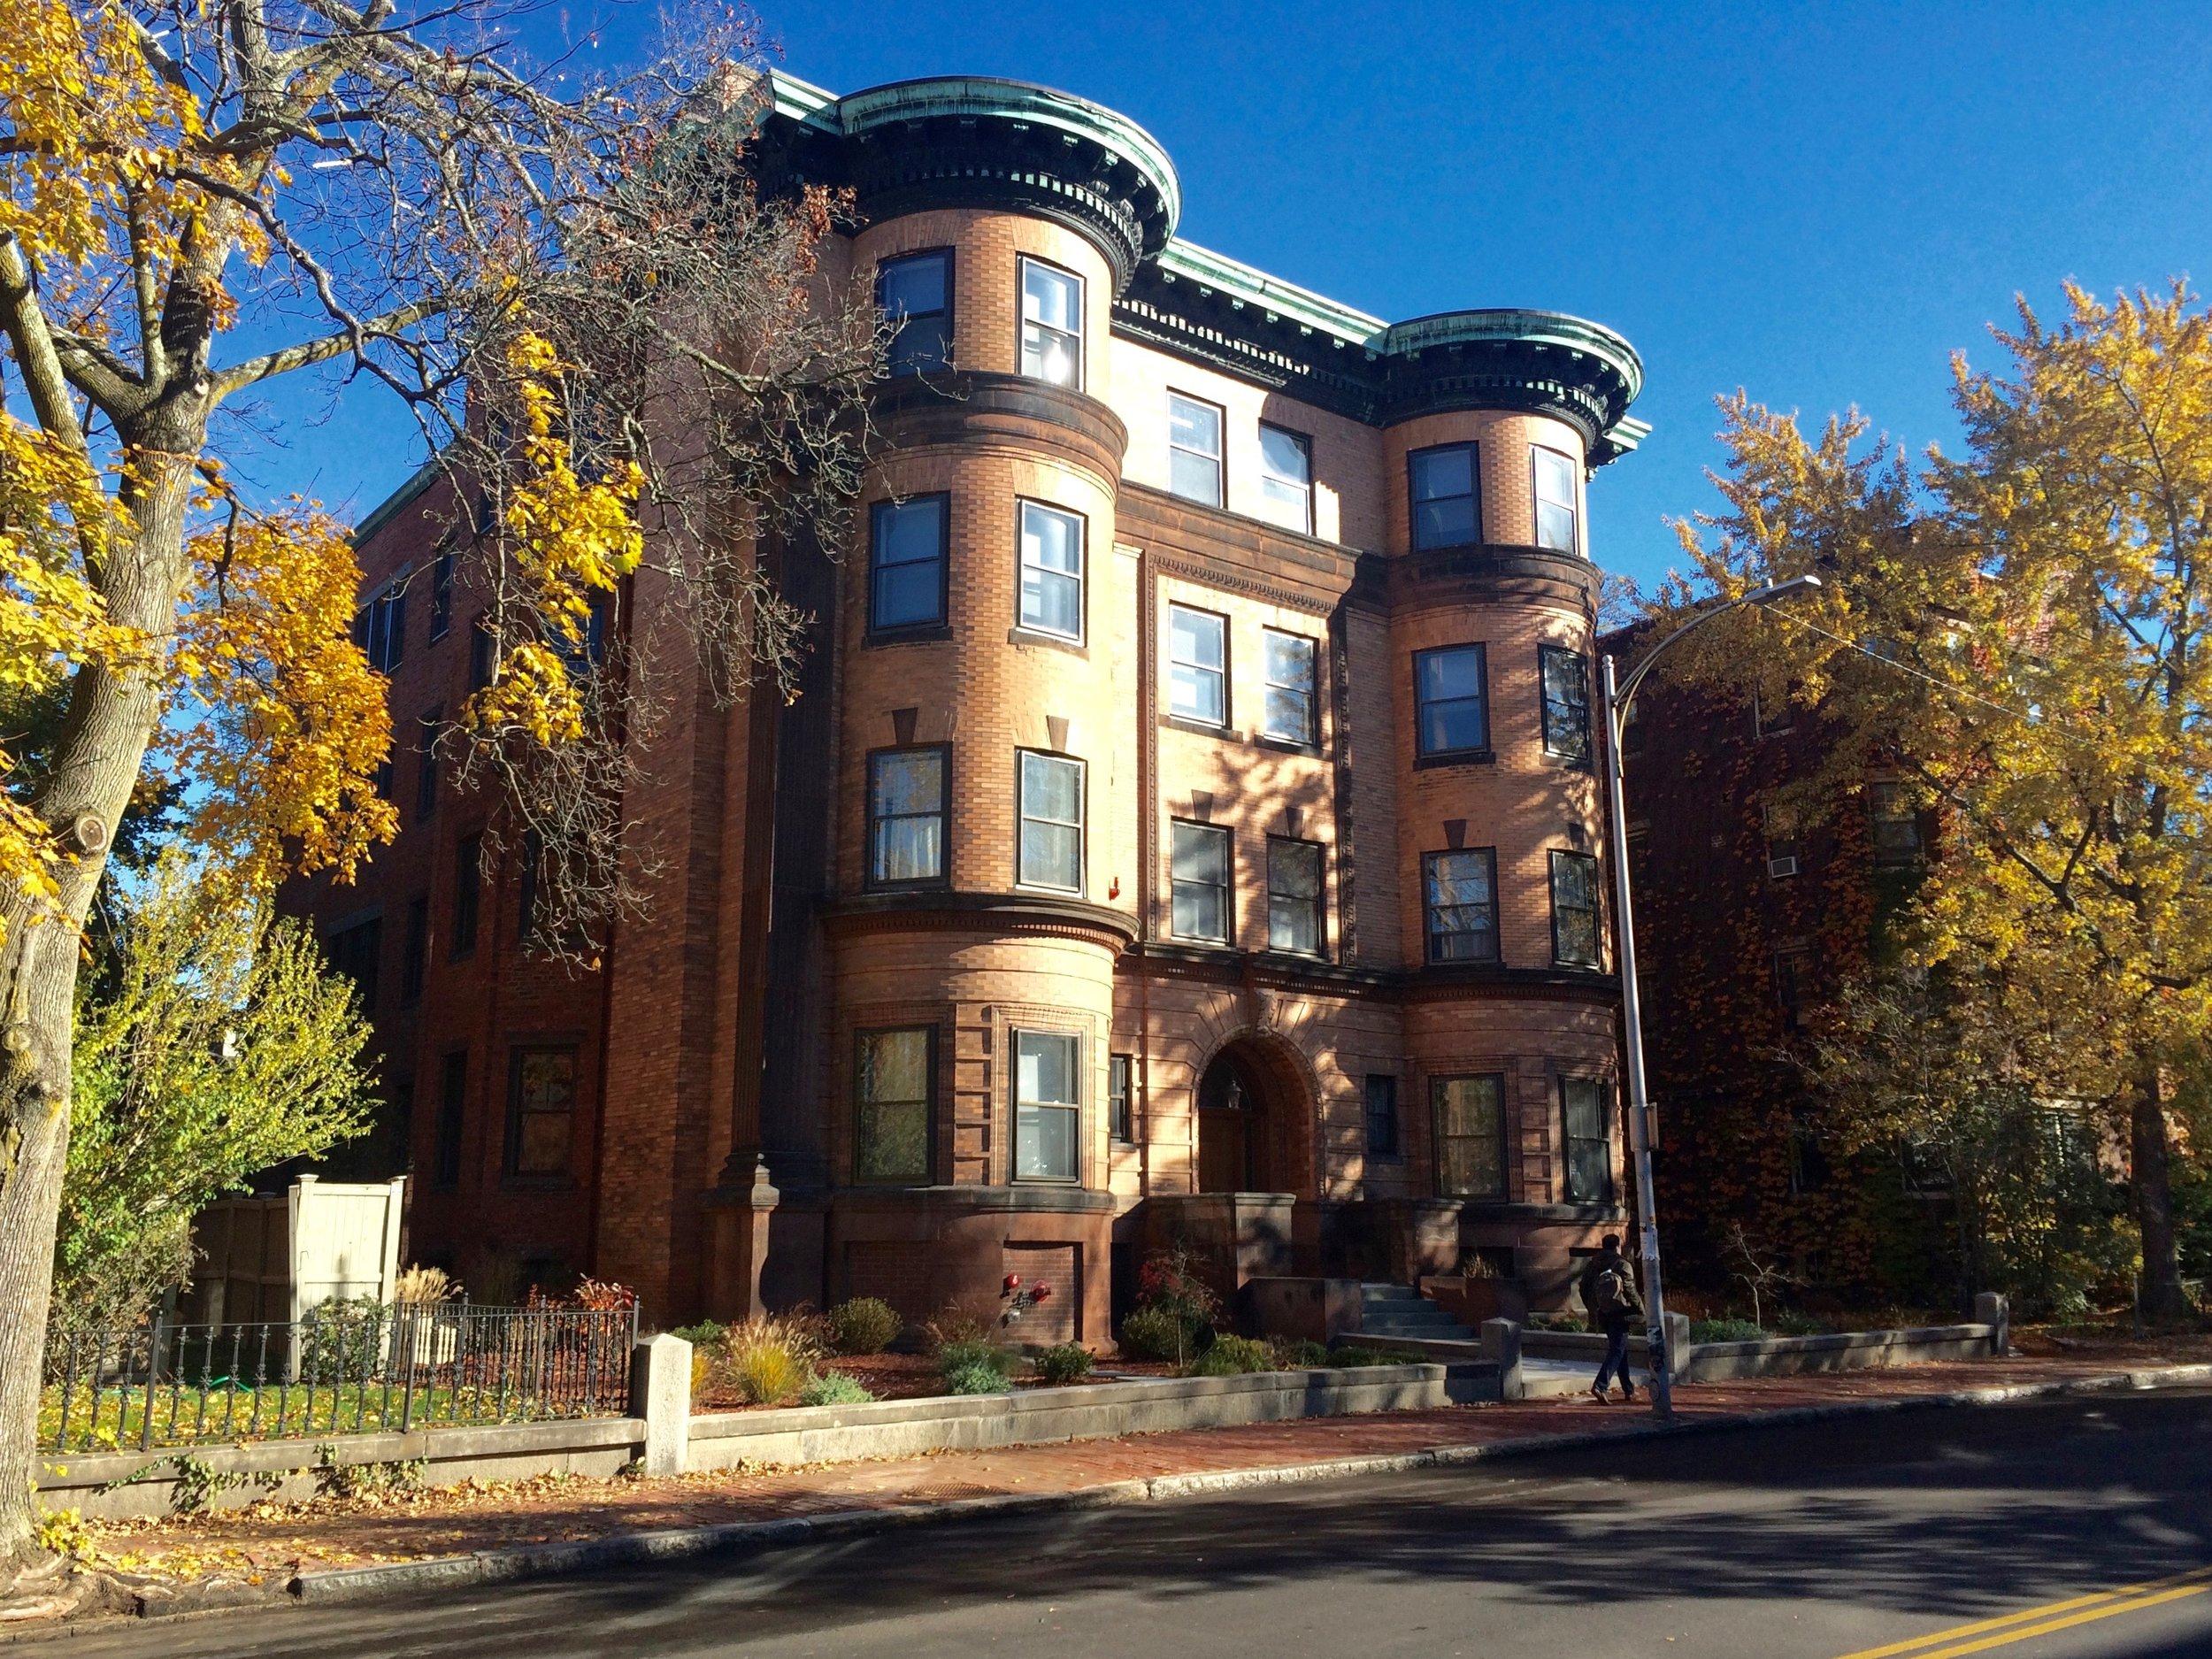 365 Harvard Street - $7,280,000